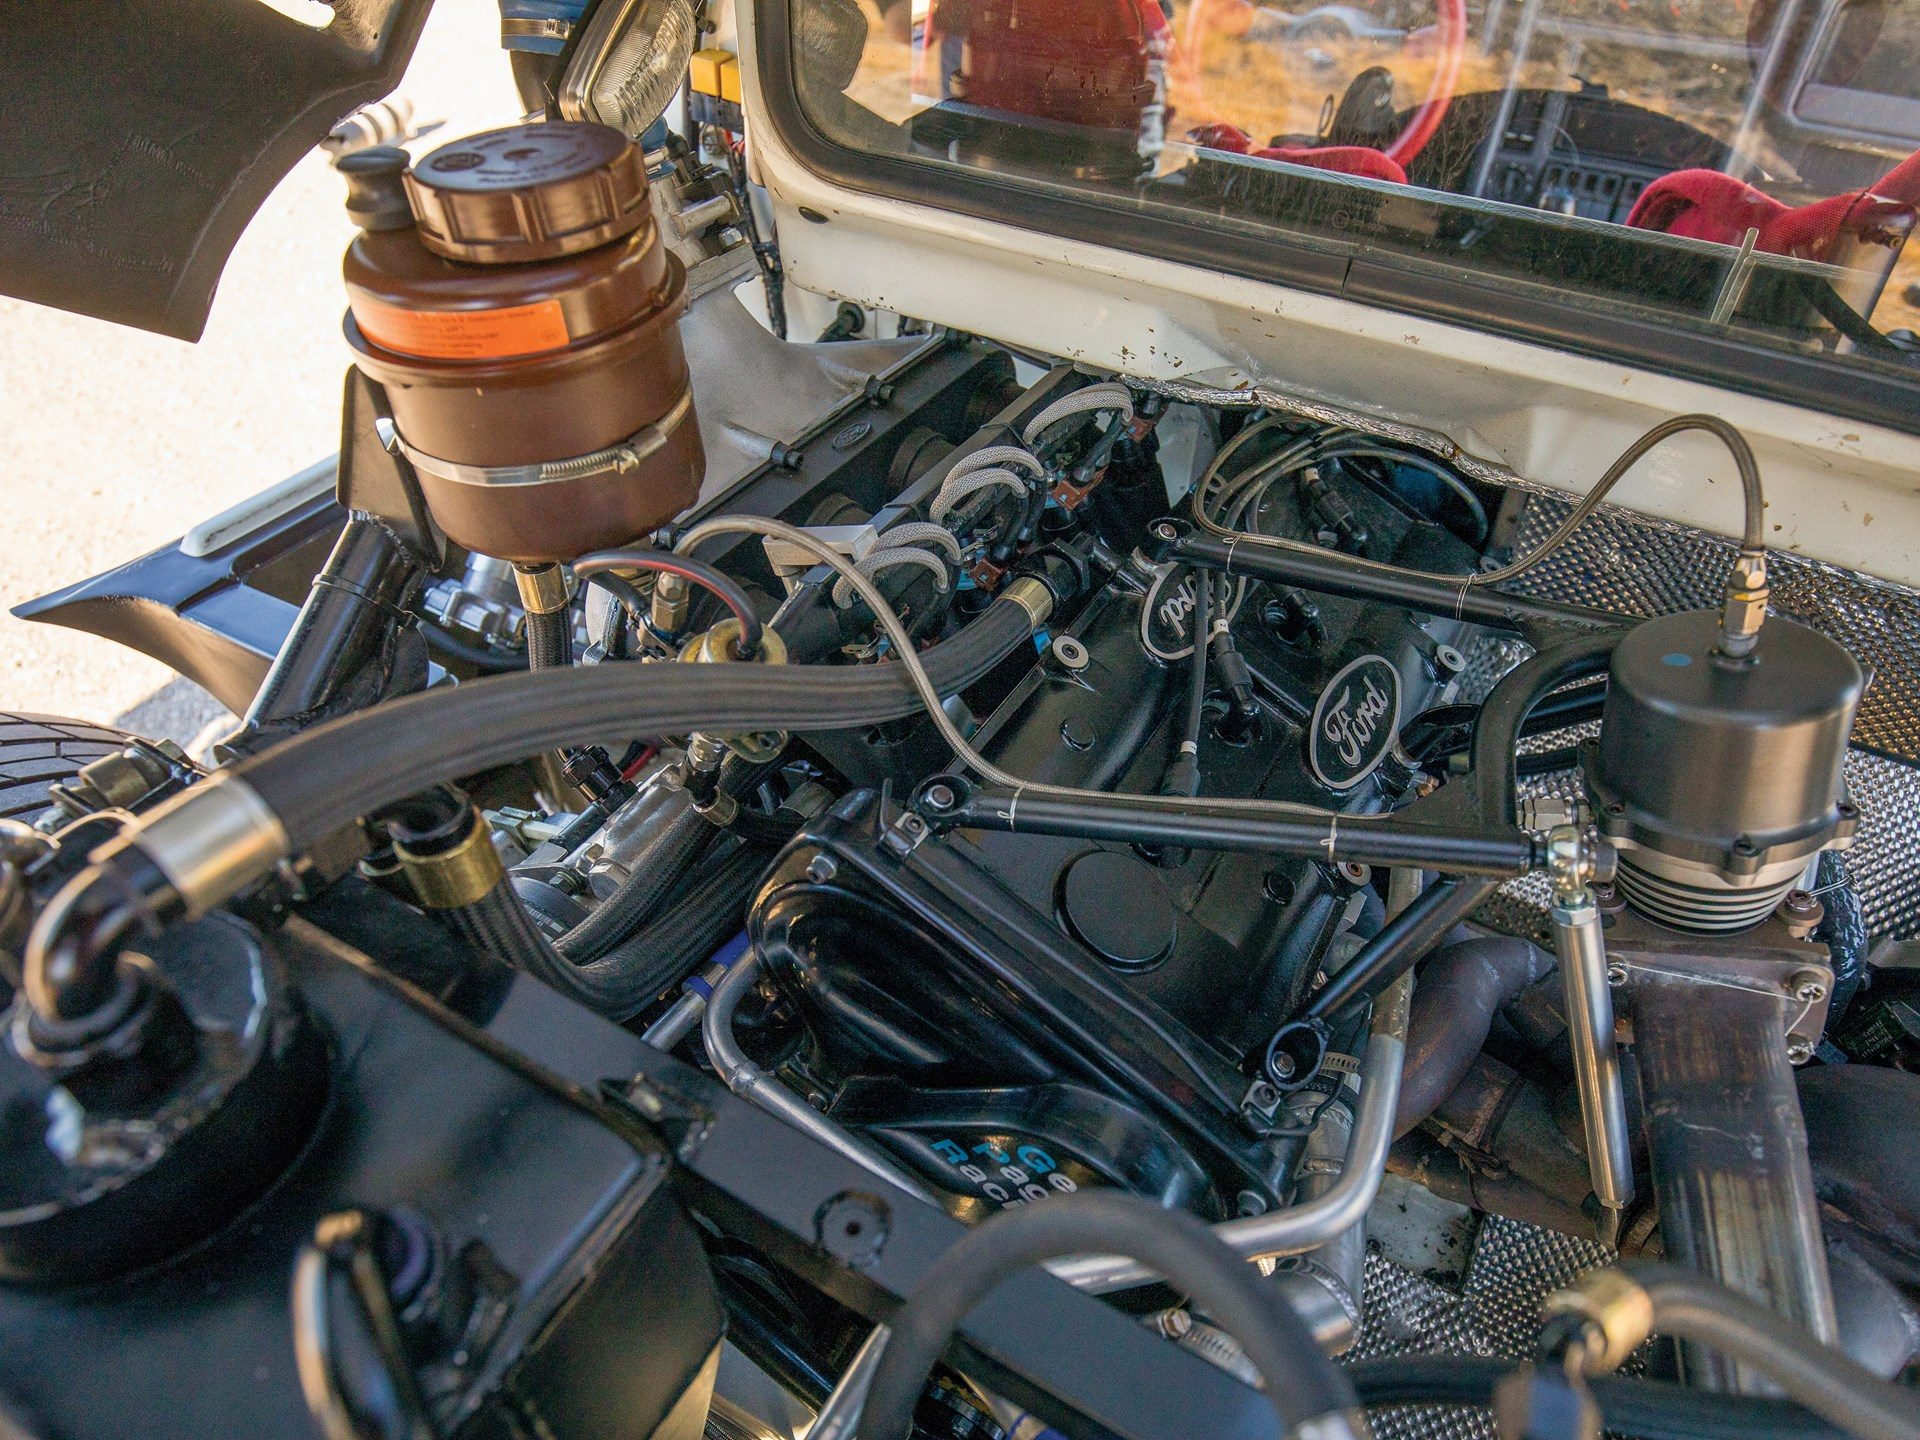 1986 Ford RS200 Evolution cosworth 2.1 liter engine